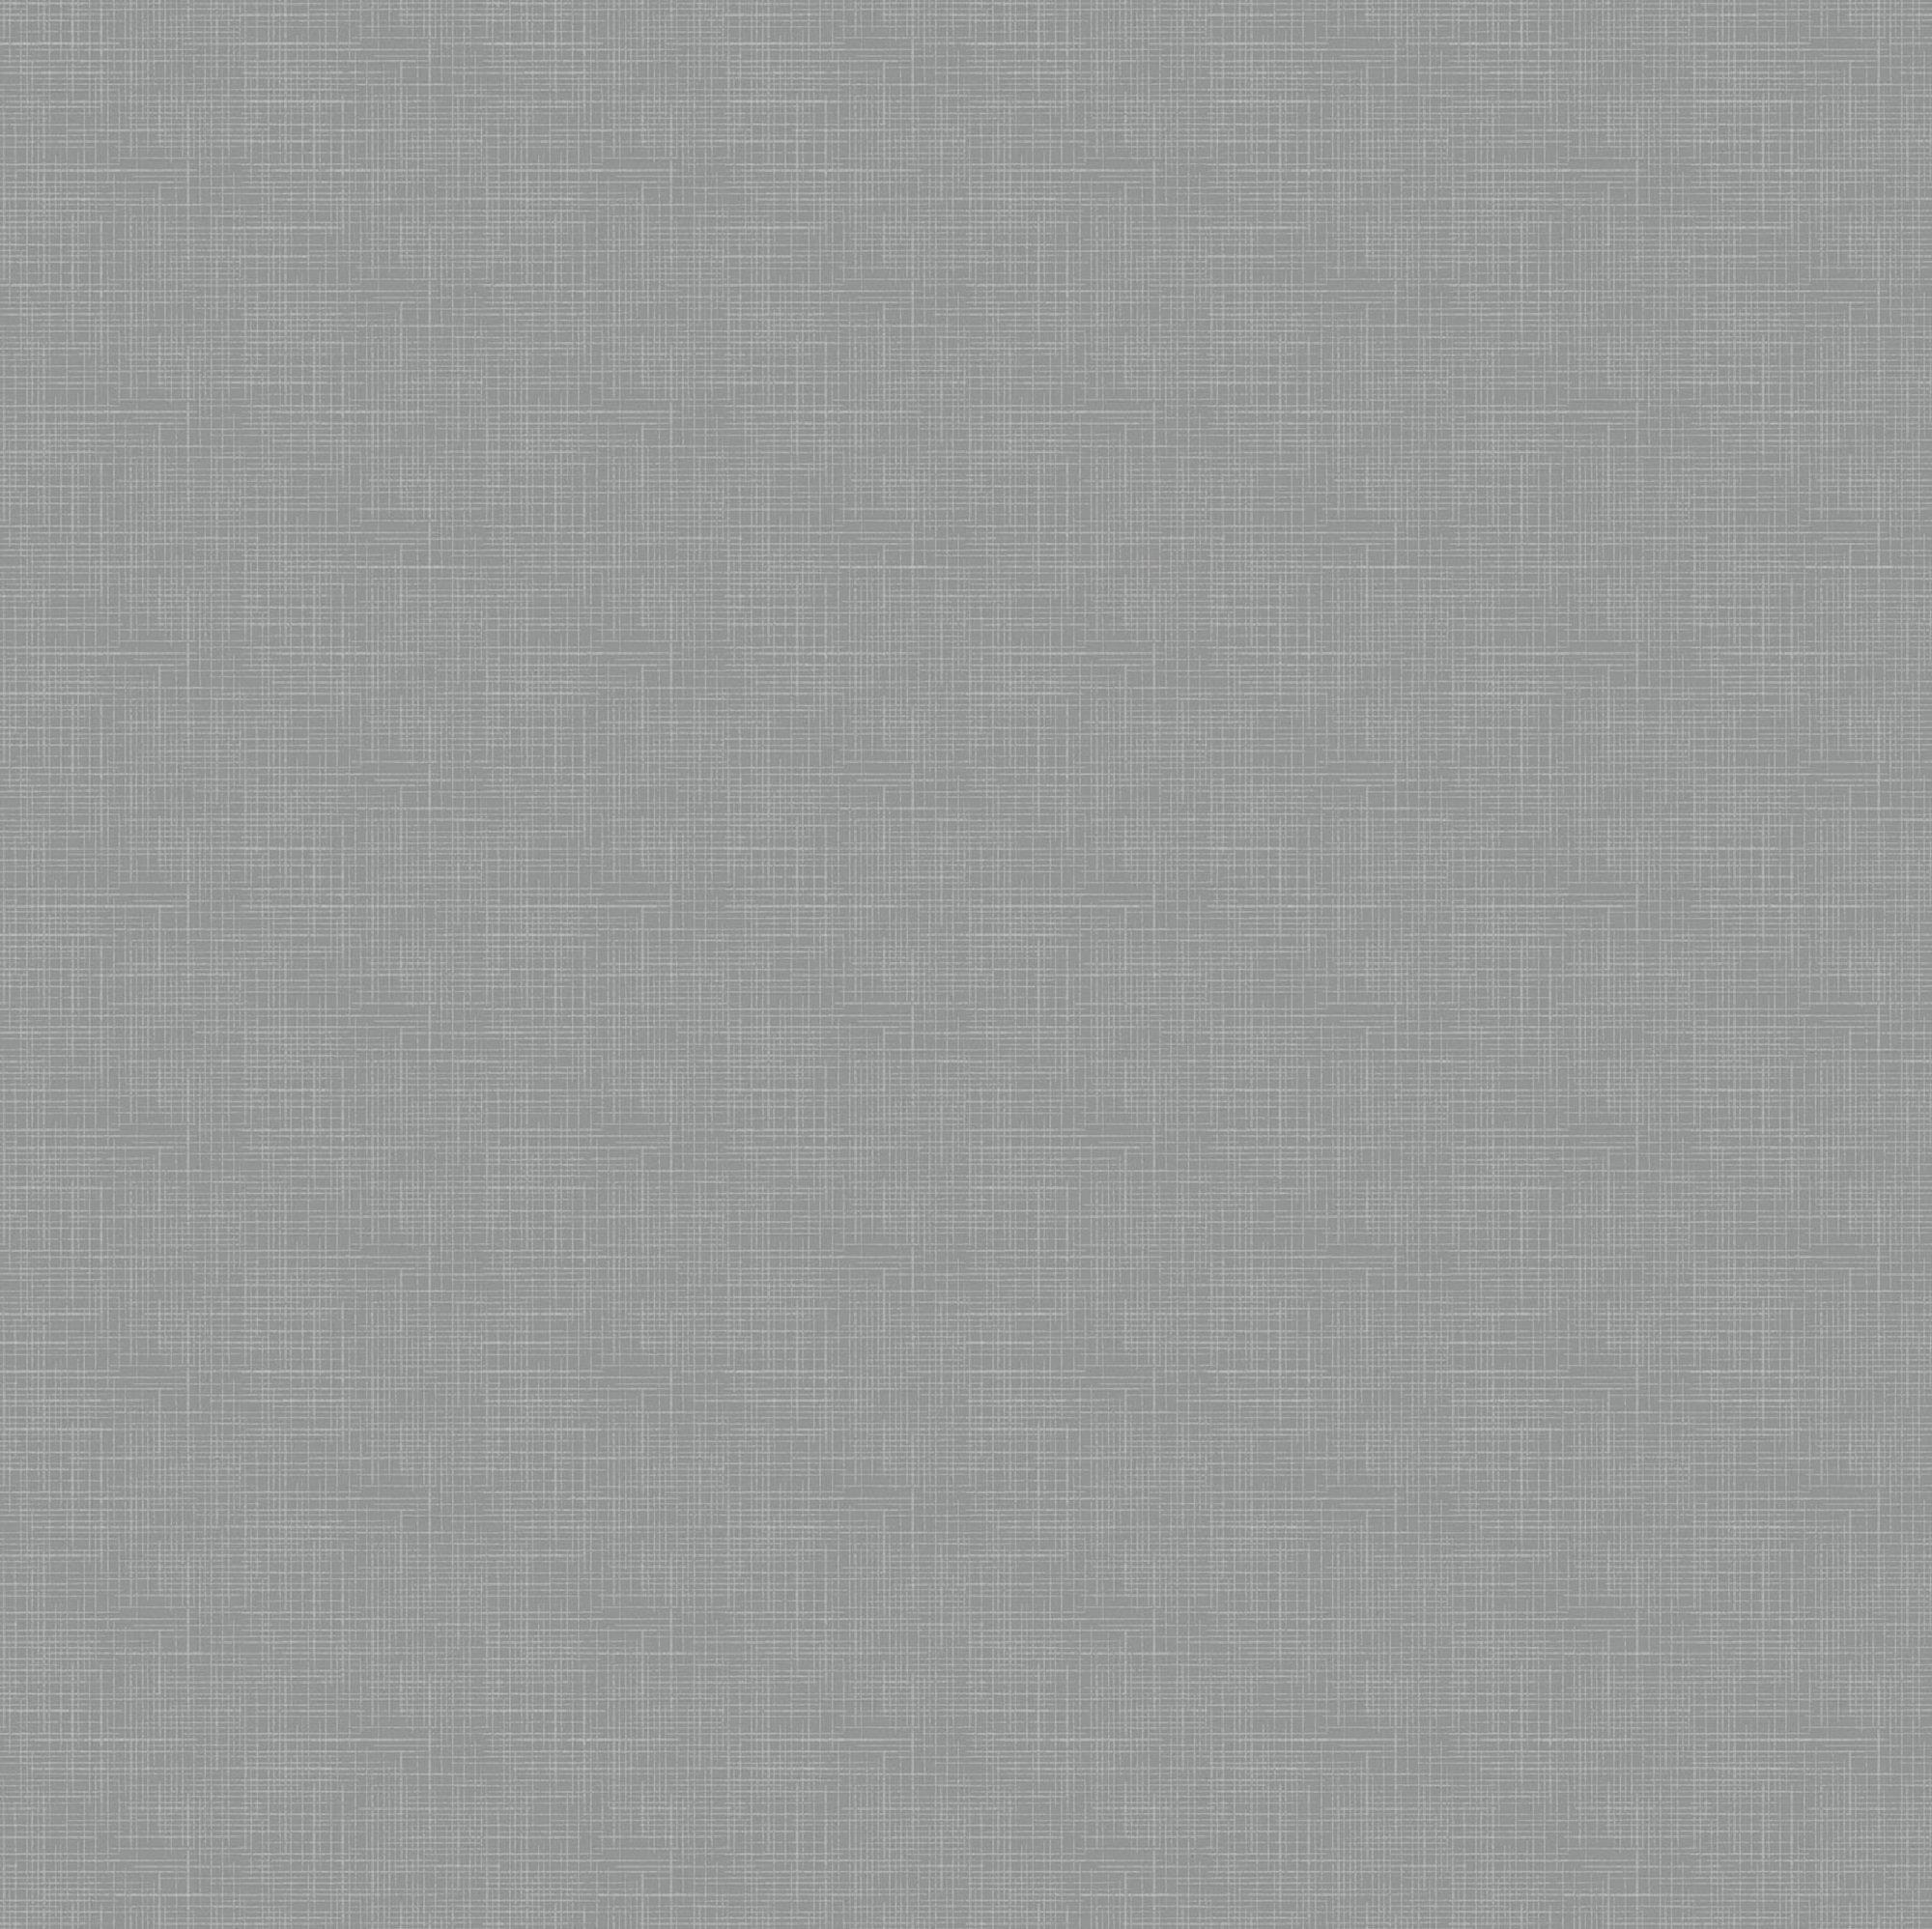 Dublin Fabric - City Scope - 9040-94 - Half Yard